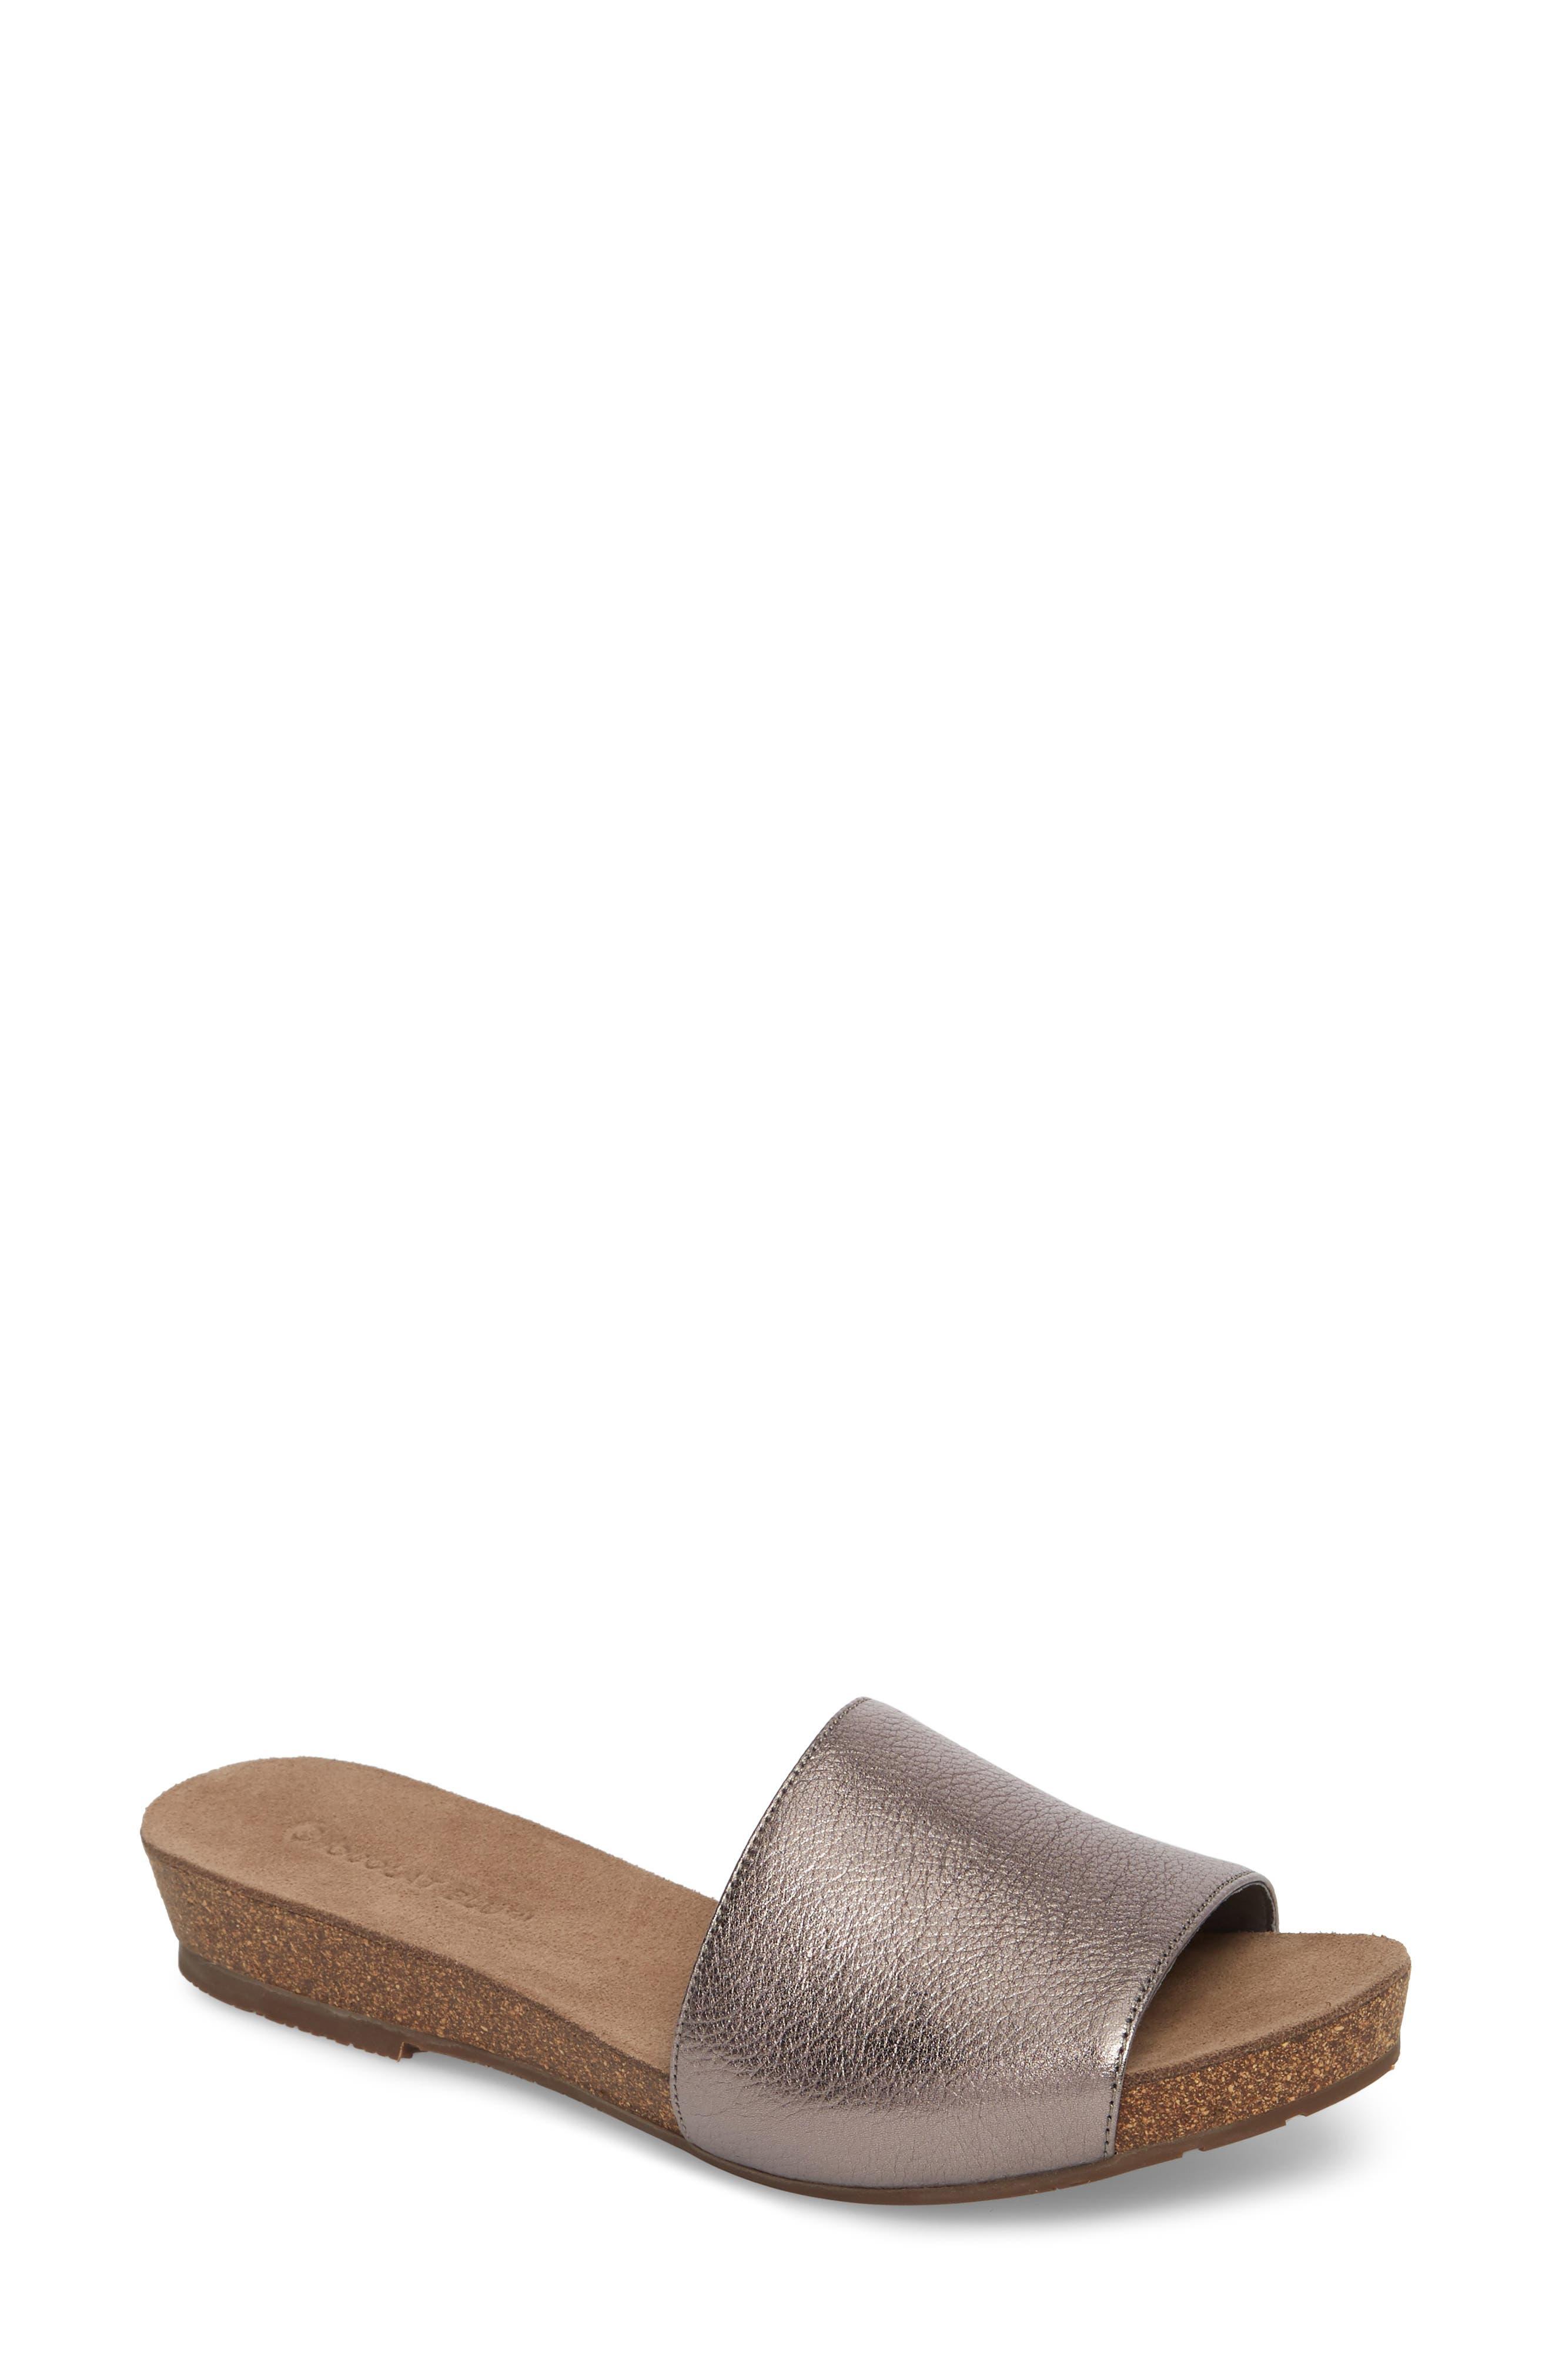 Chocolat Blu Viveca Slide Sandal, Grey